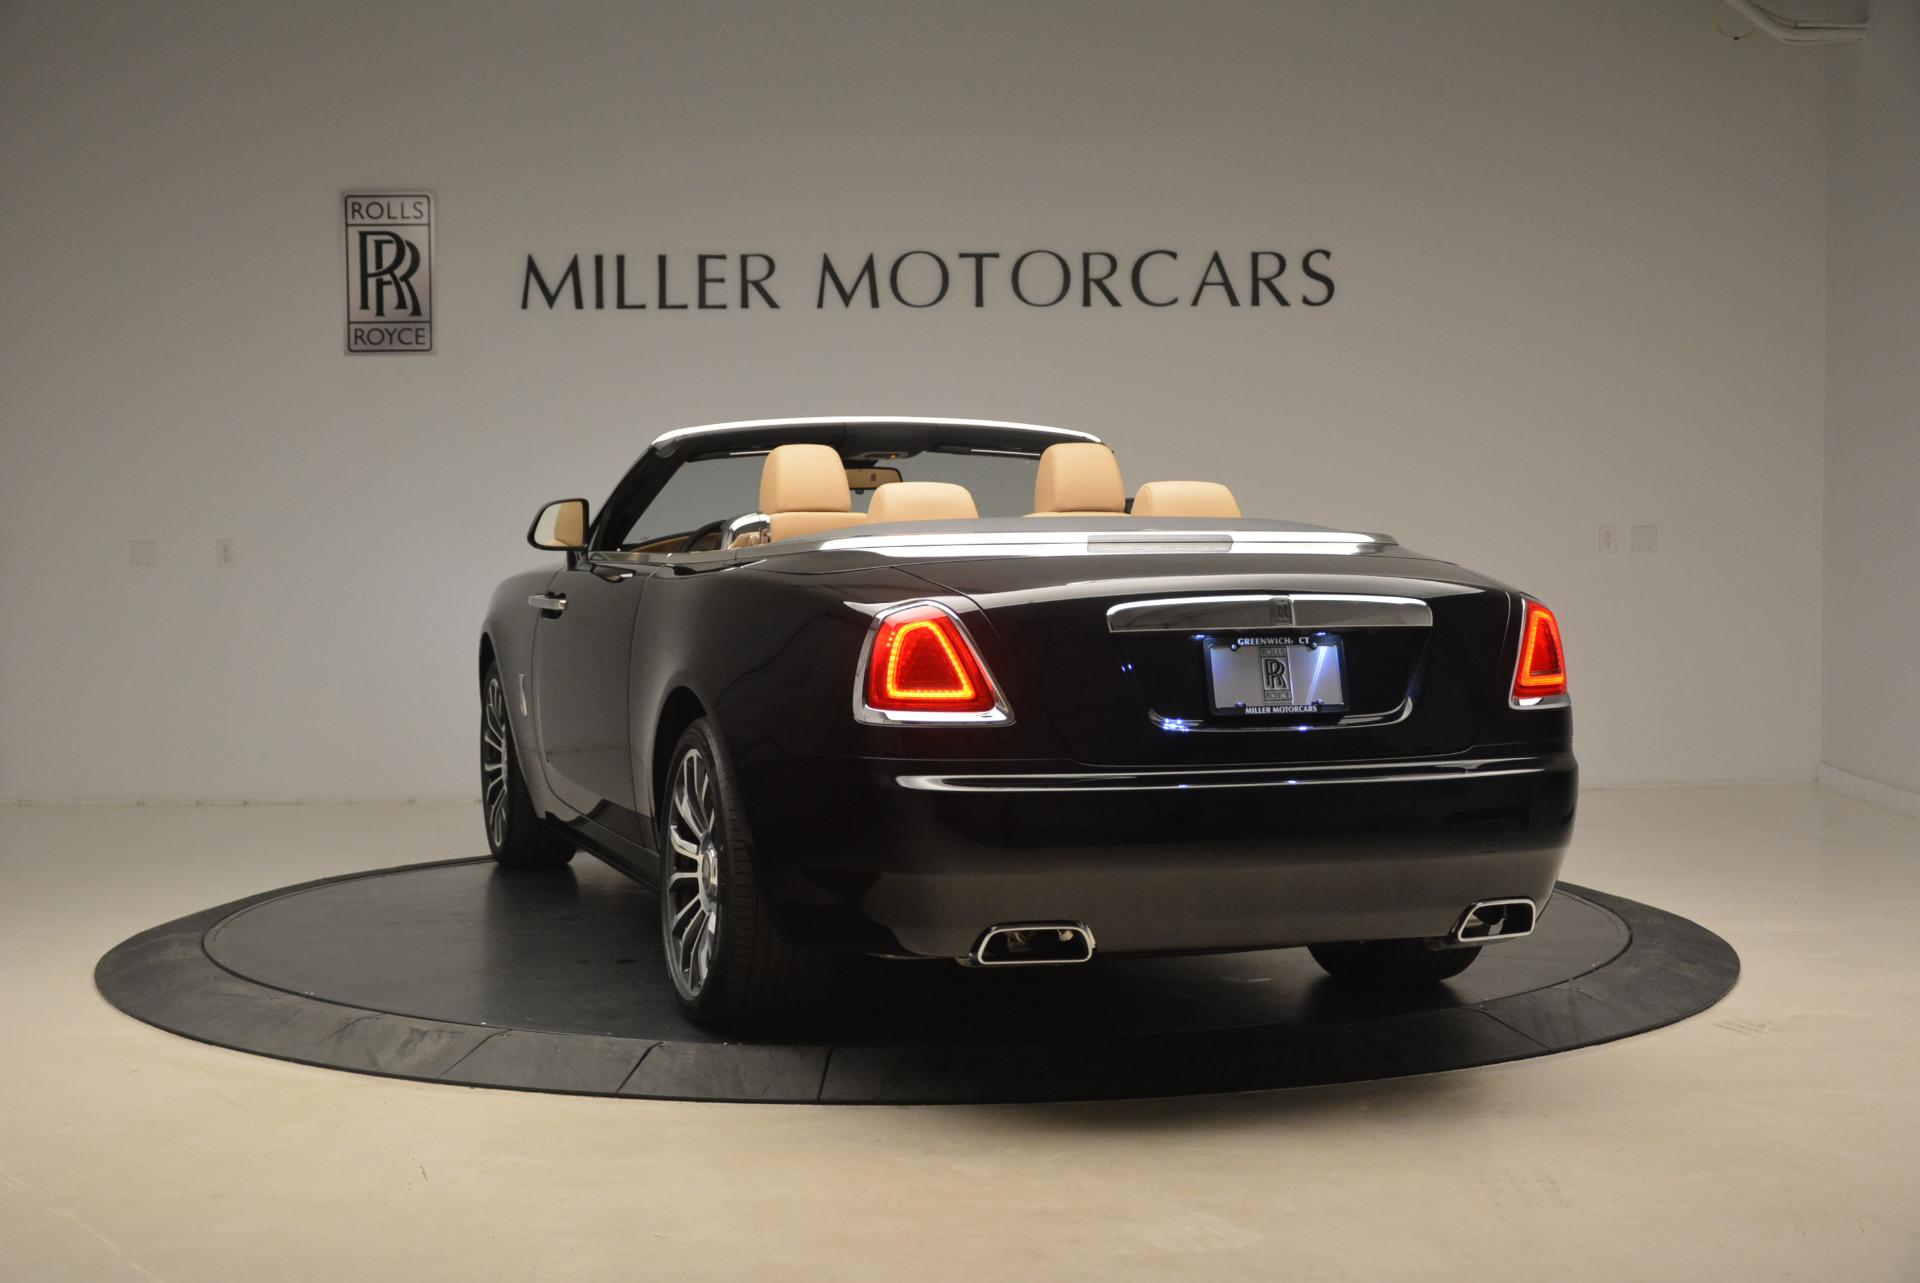 Used 2018 Rolls-Royce Dawn  For Sale In Greenwich, CT. Alfa Romeo of Greenwich, R461 2105_p5